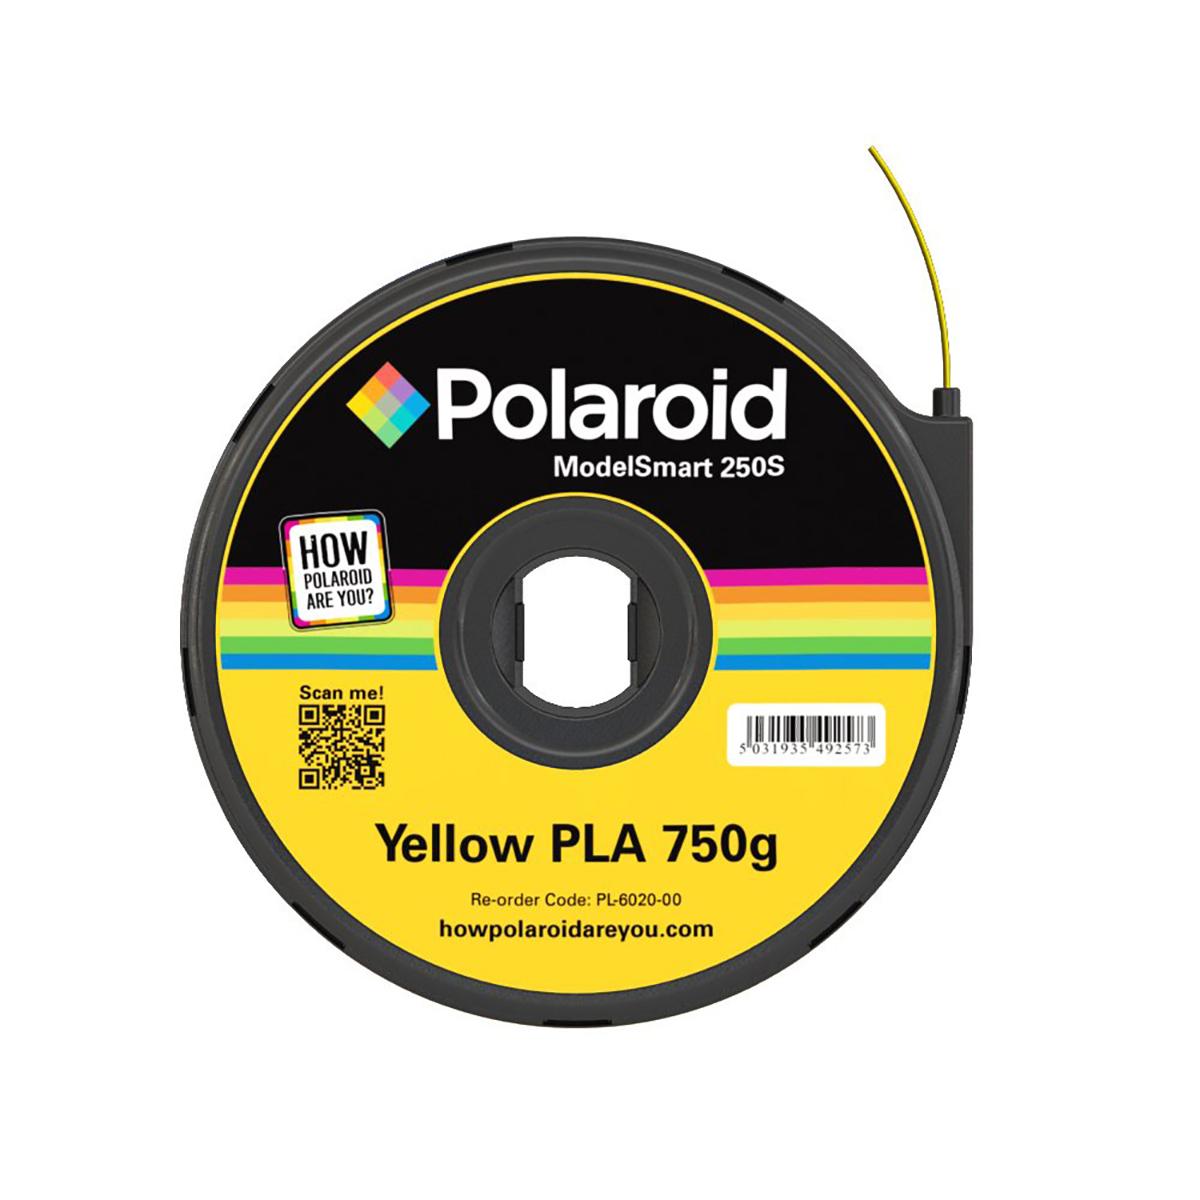 Polaroid ModelSmart 250S Yellow Filament Cartridge - 750g